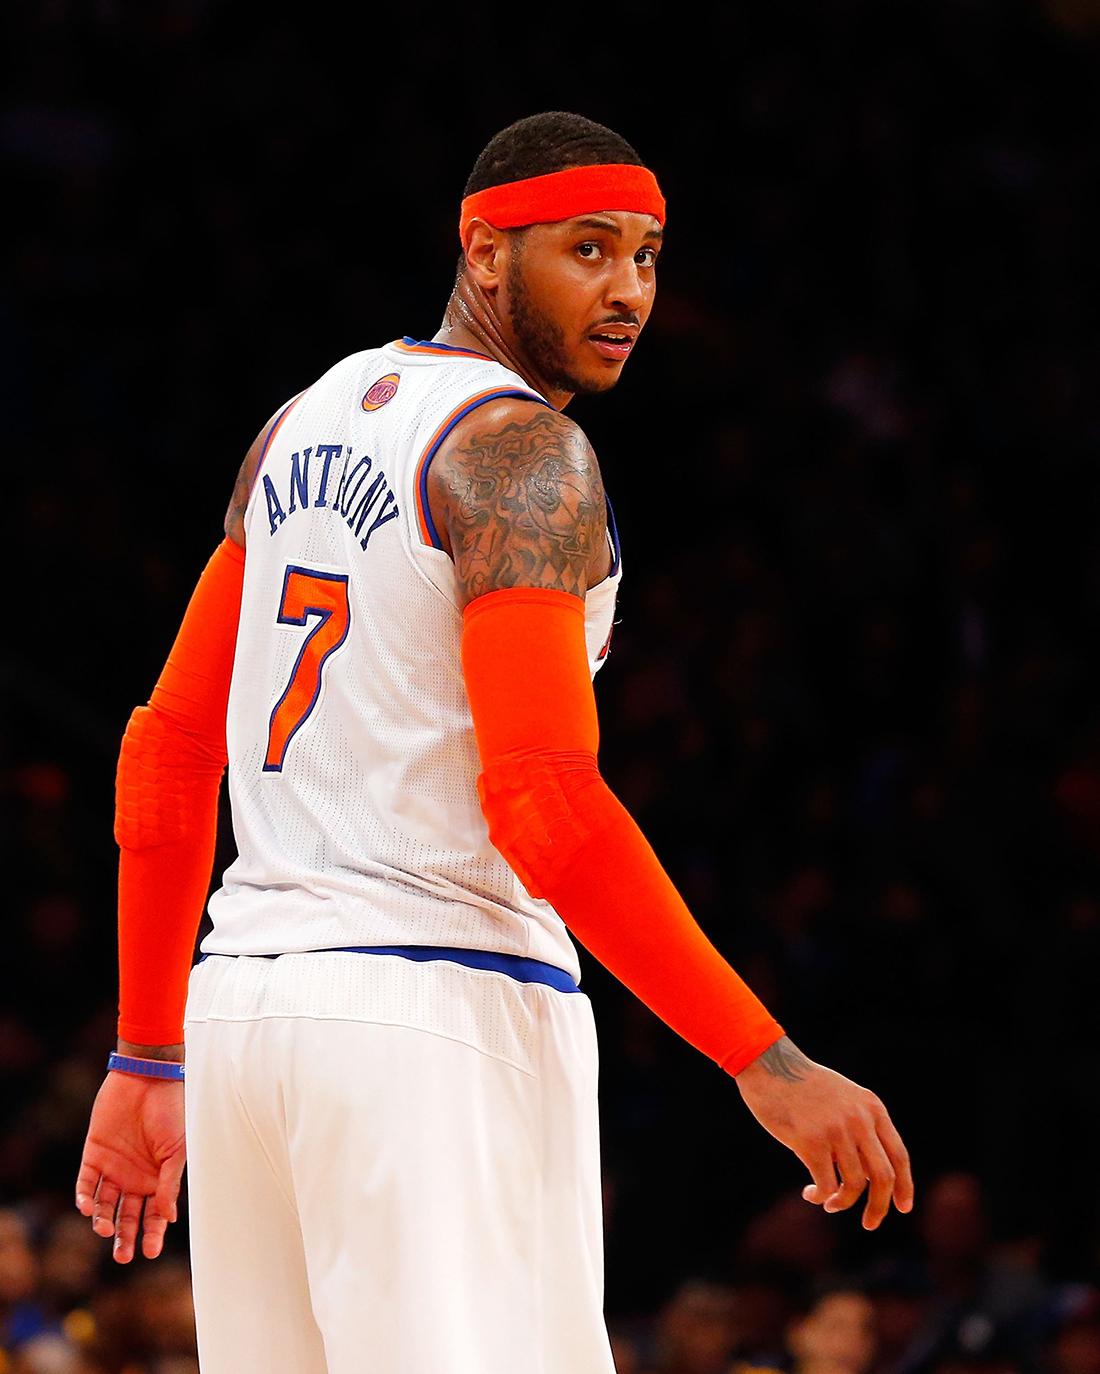 Carmelo Anthony en viva basquet